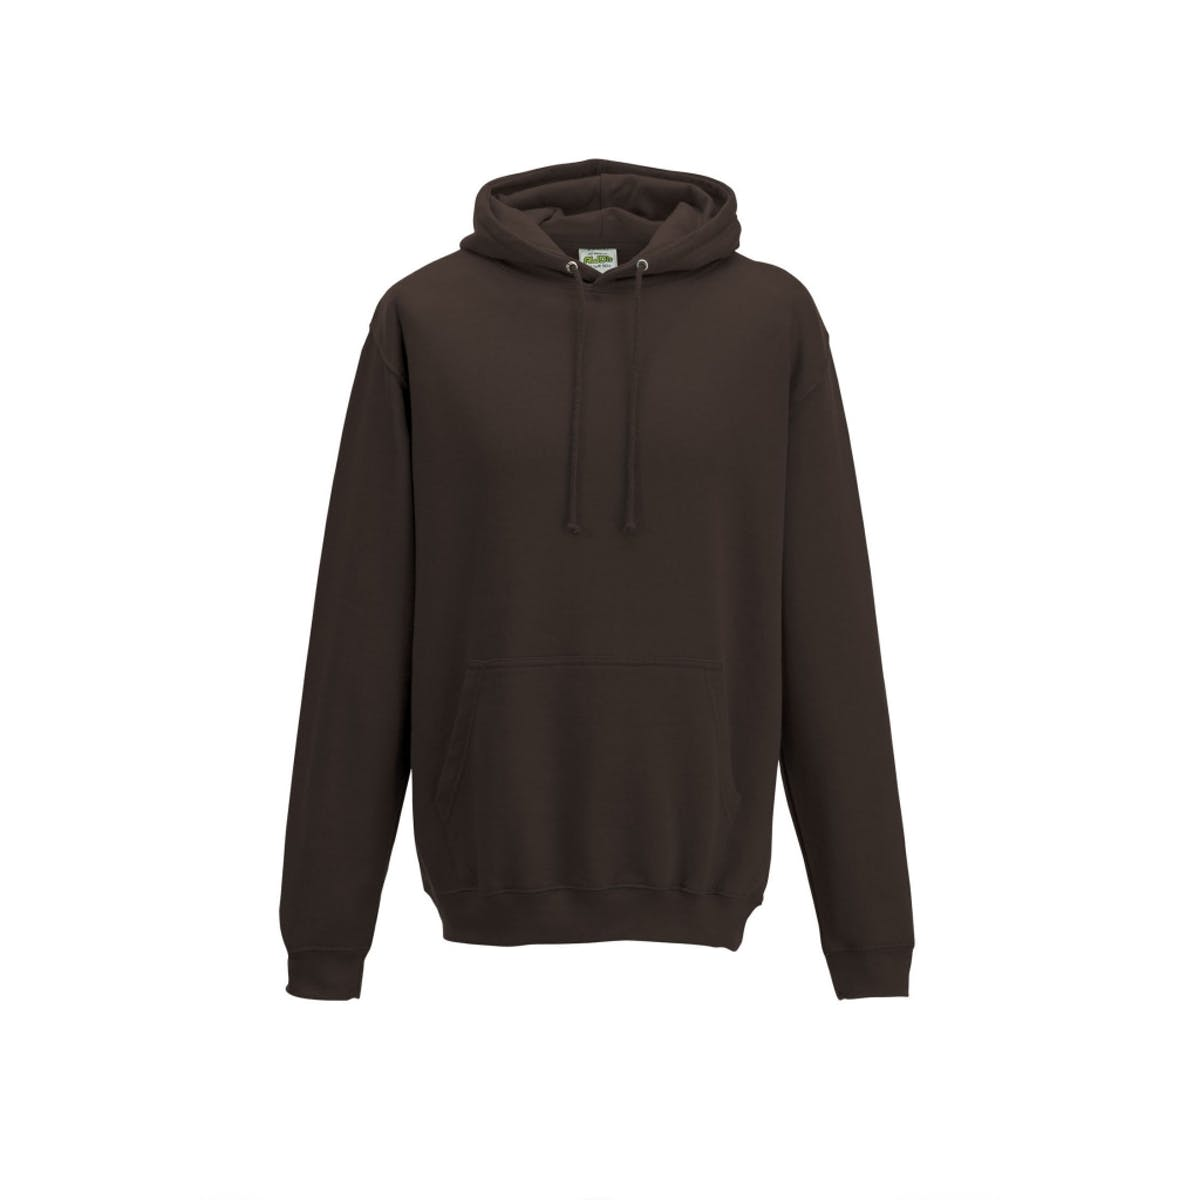 hot choc college hoodies